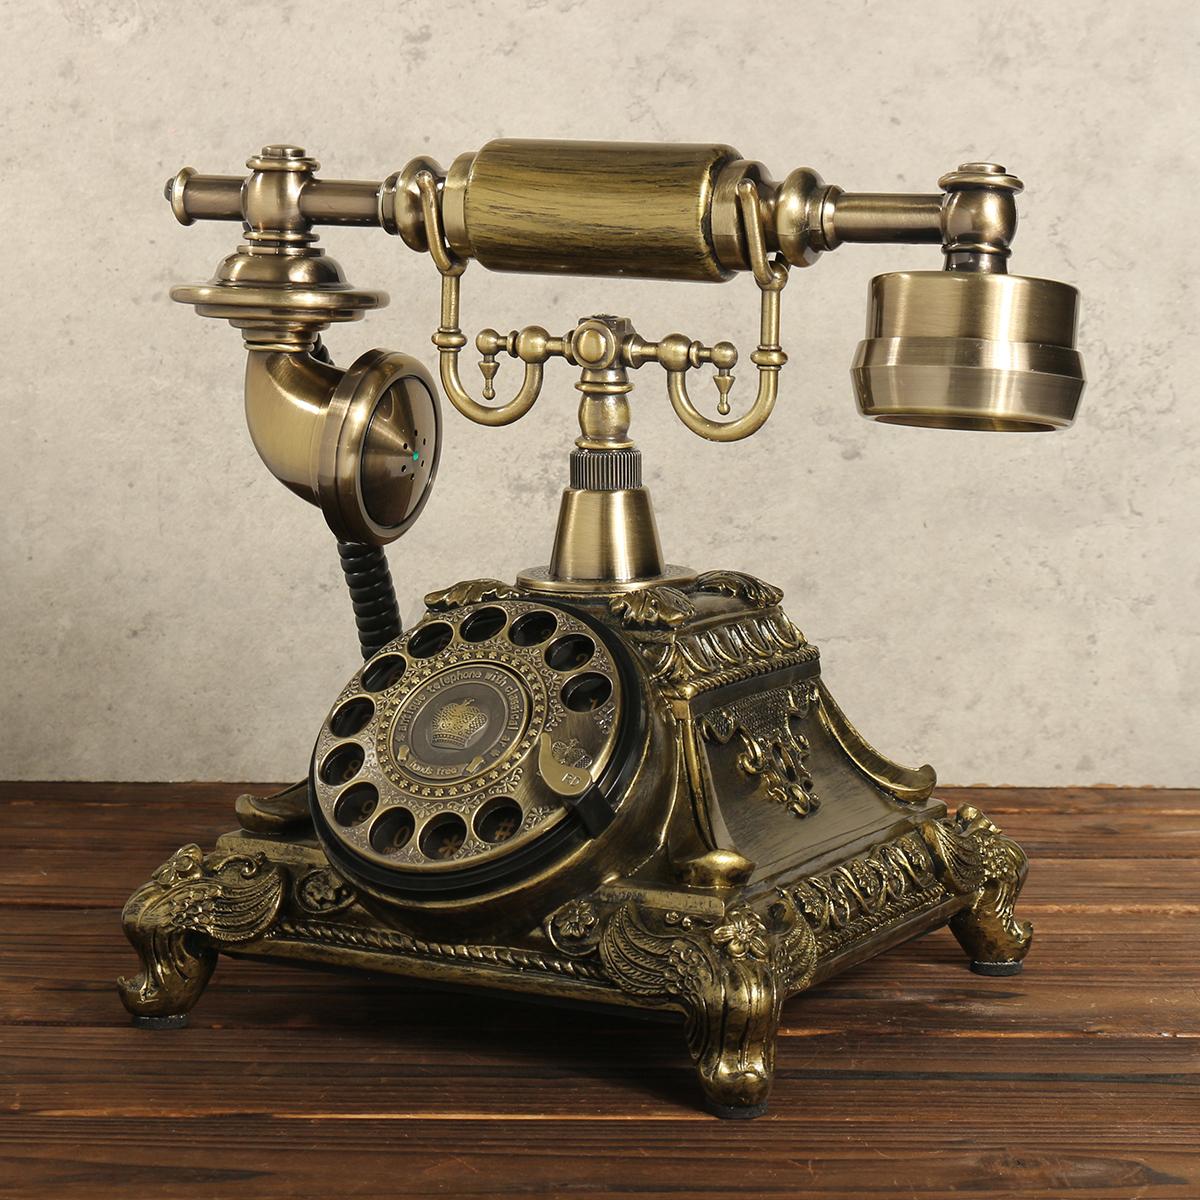 vintage rotary t l phone fixe cadran rotatif main libre old phone bureau ancien ebay. Black Bedroom Furniture Sets. Home Design Ideas